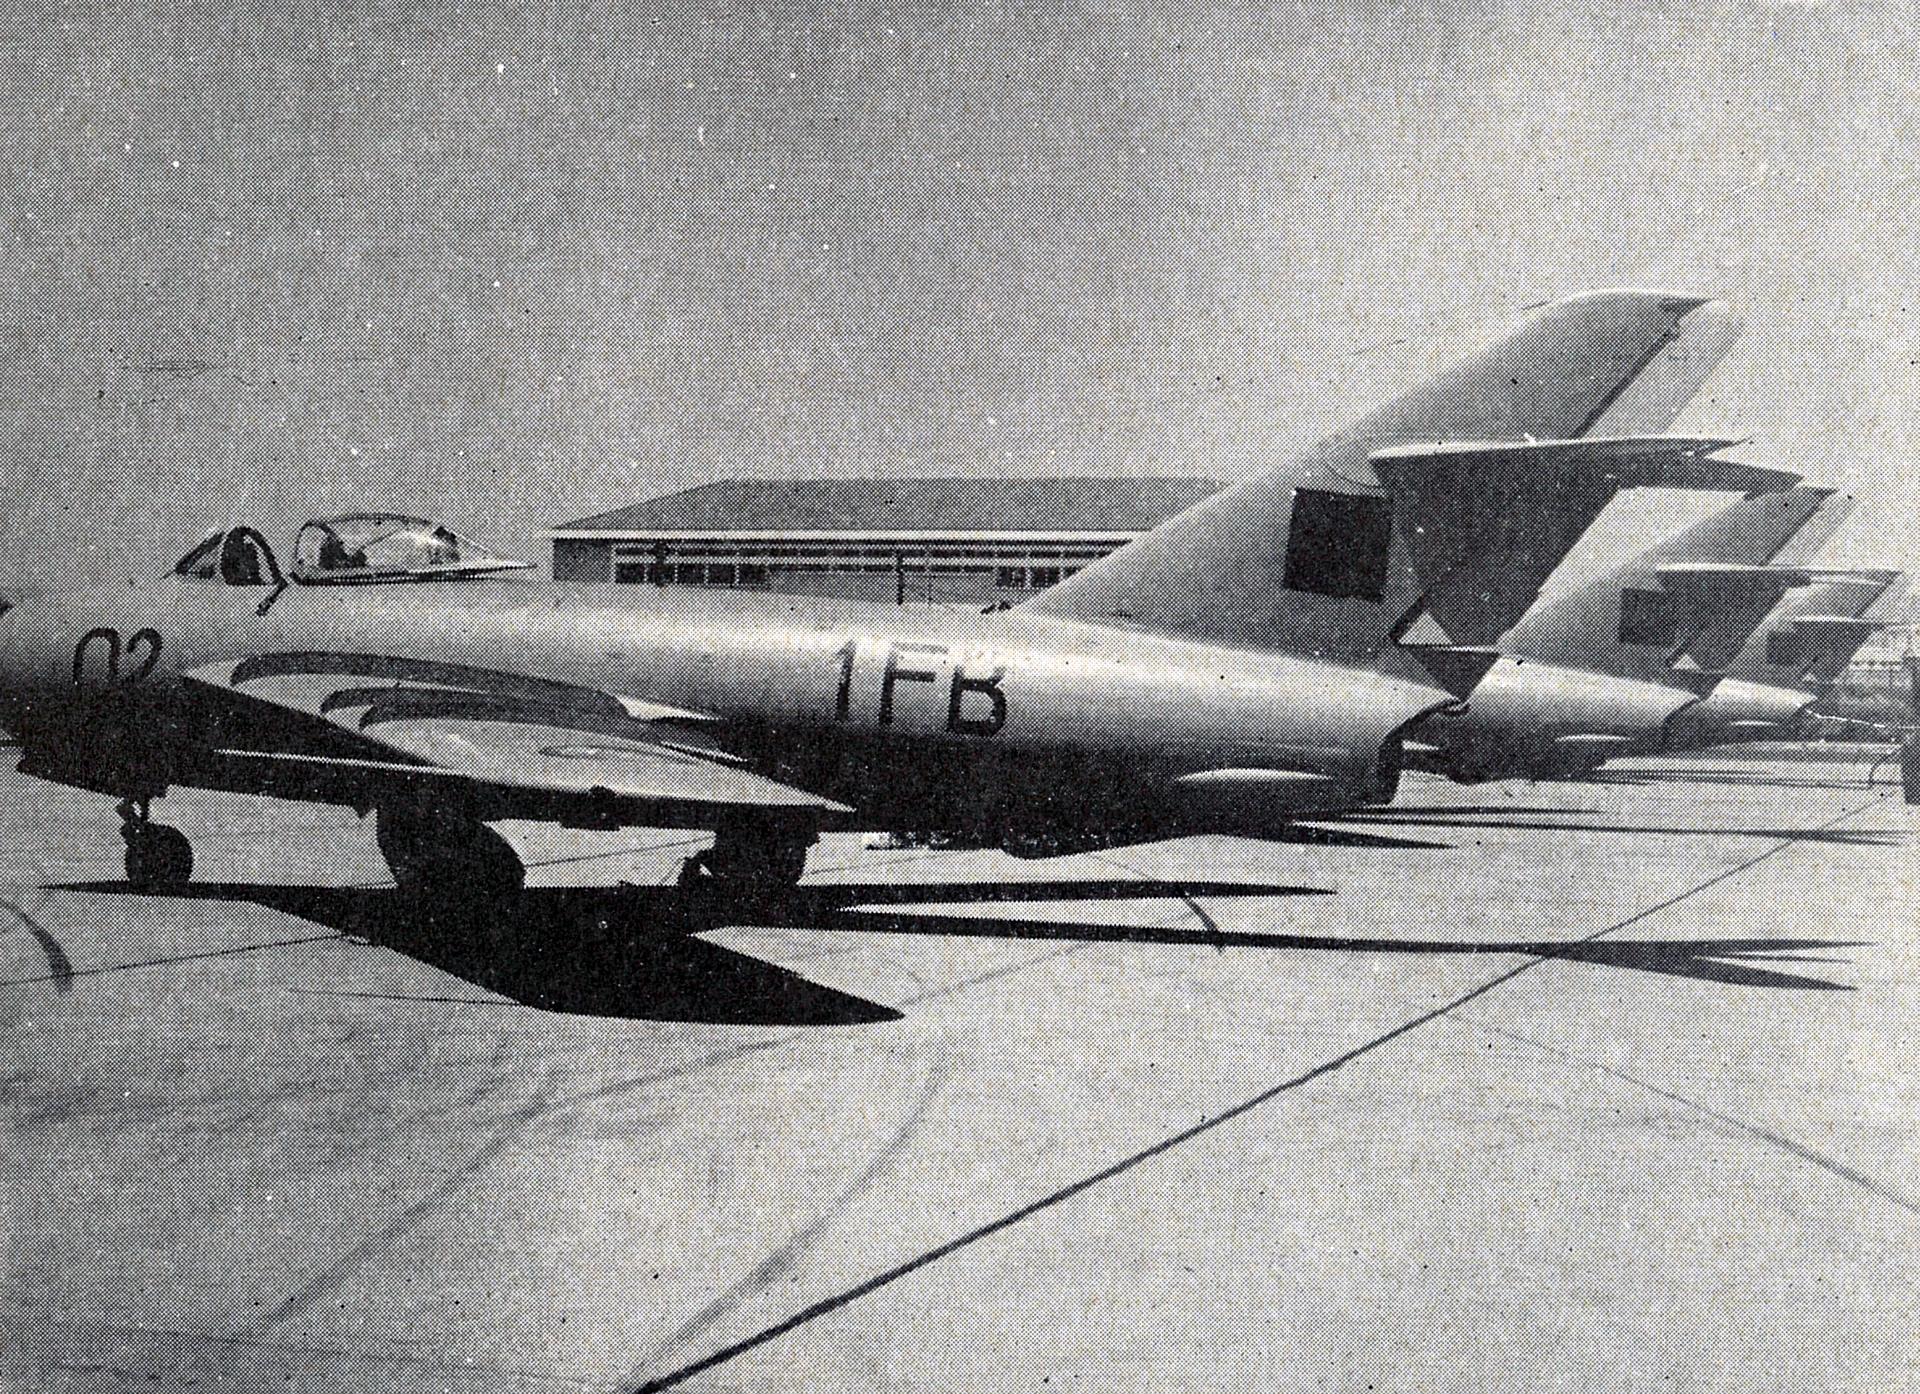 Histoire des Forces Royales Air 32030833031_0693f10183_o